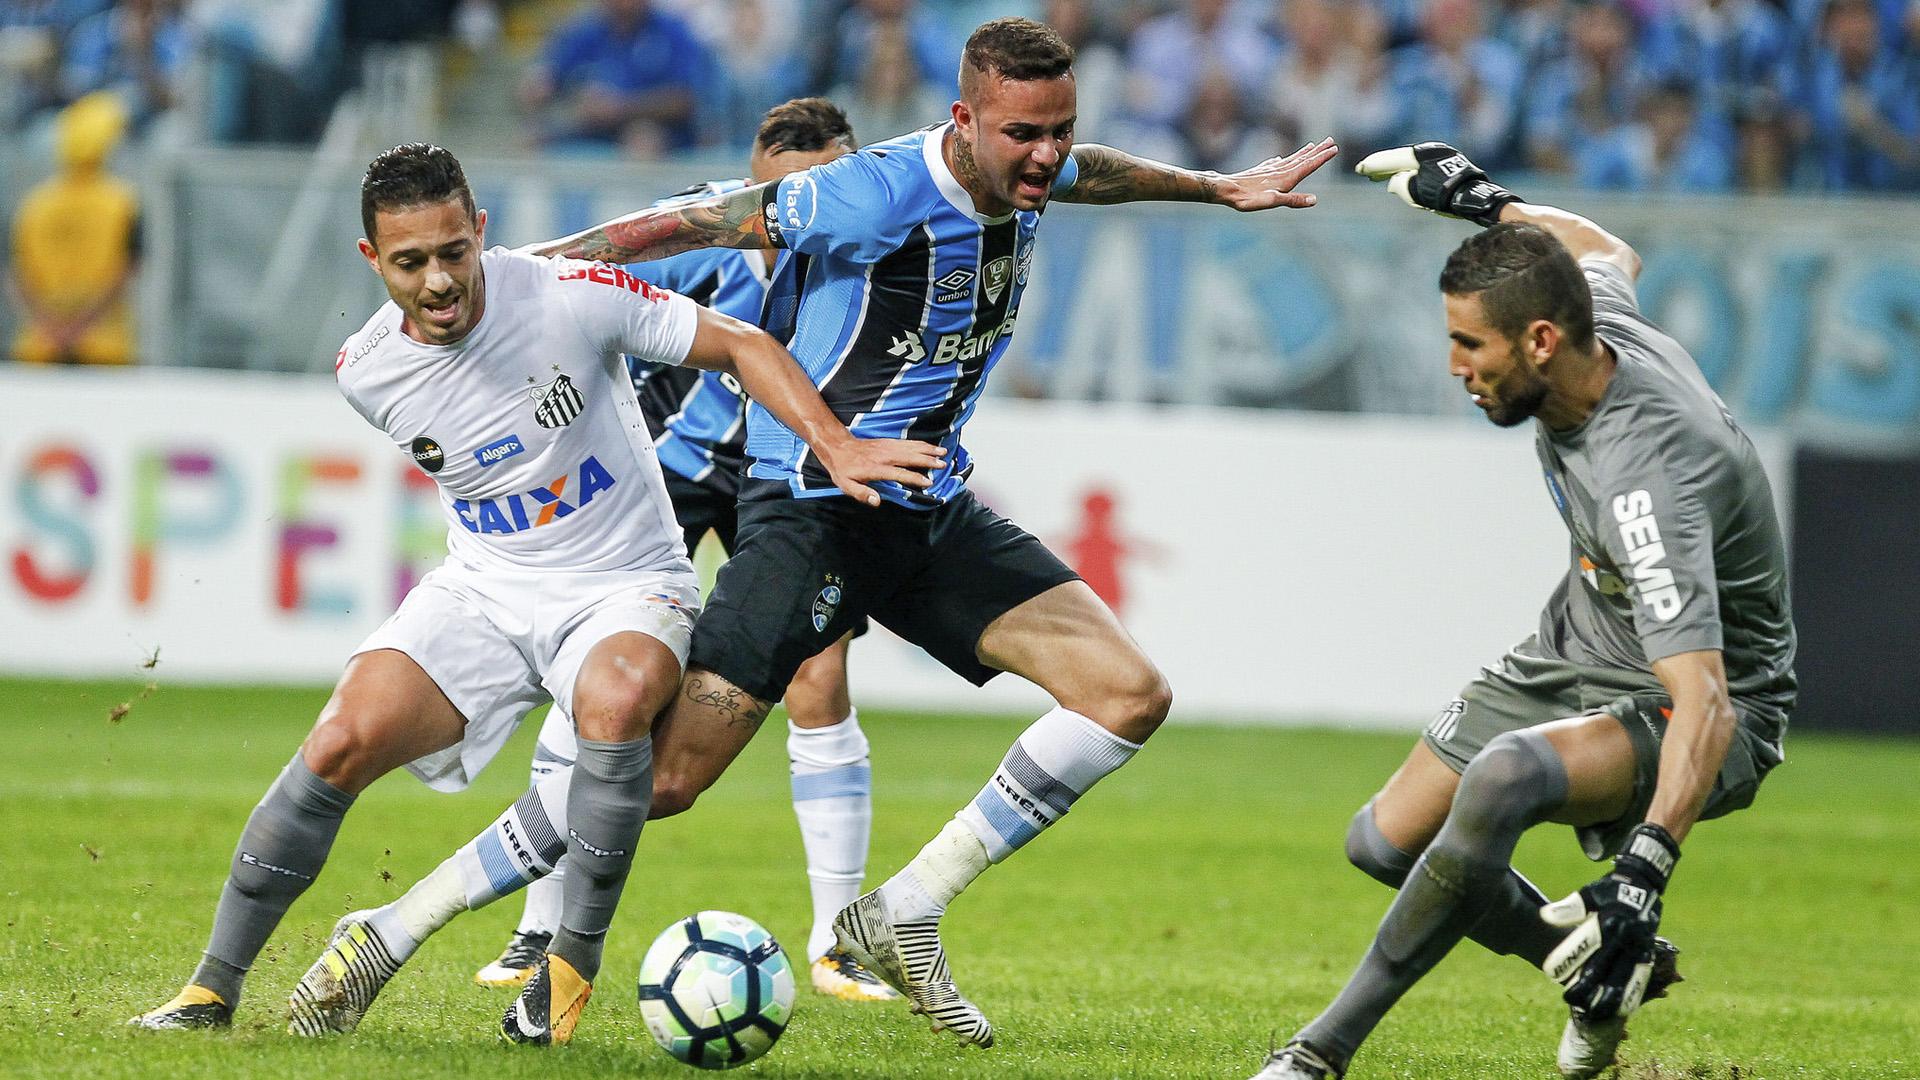 Luan Grêmio x Santos 31 07 17